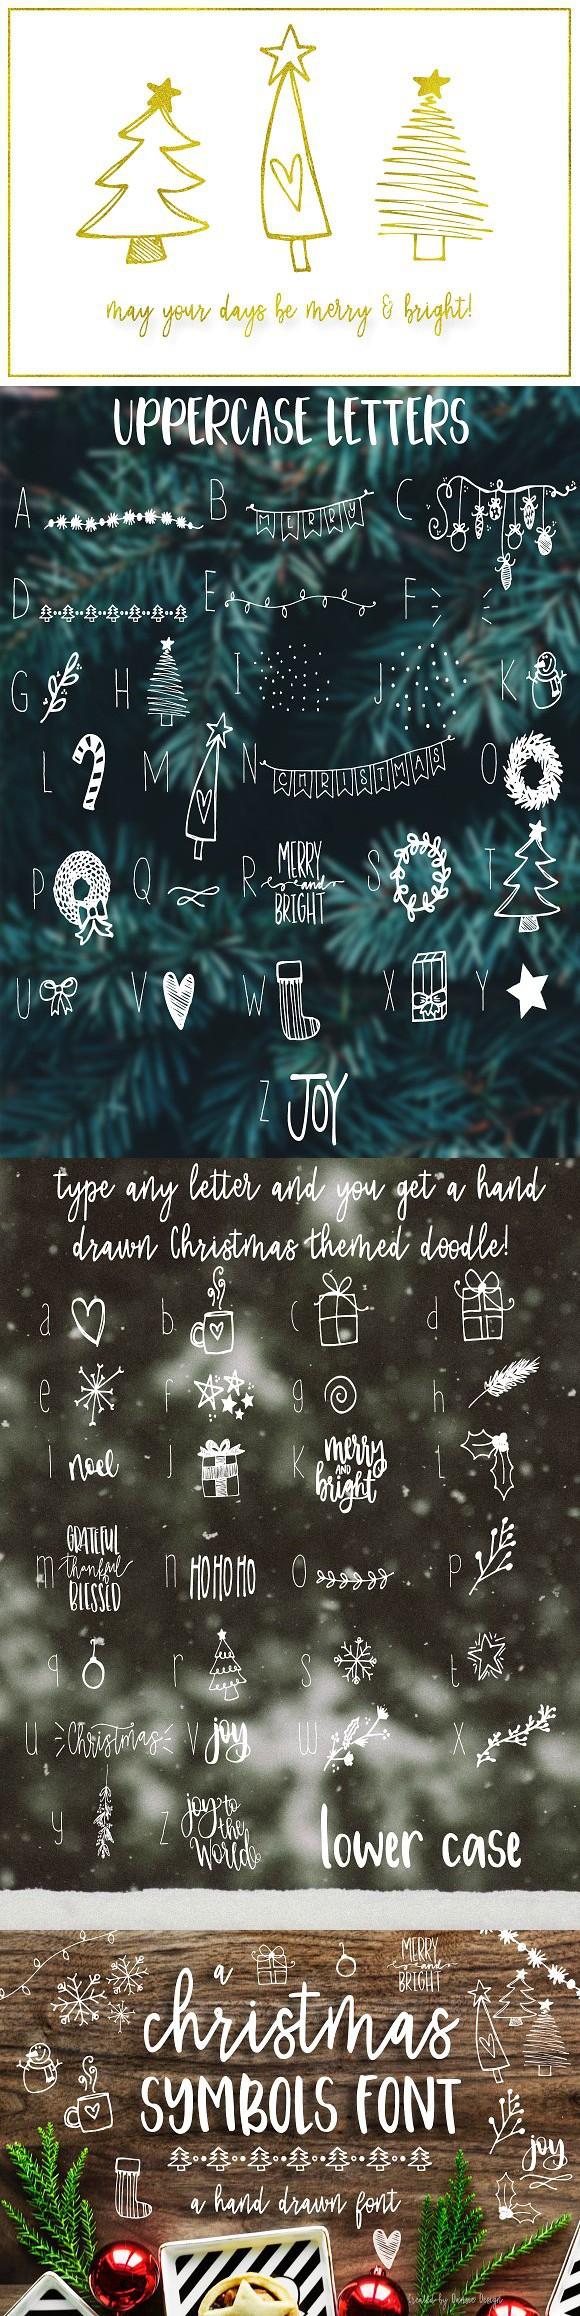 Christmas symbols font cute fonts letter pinterest fonts christmas symbols font cute fonts buycottarizona